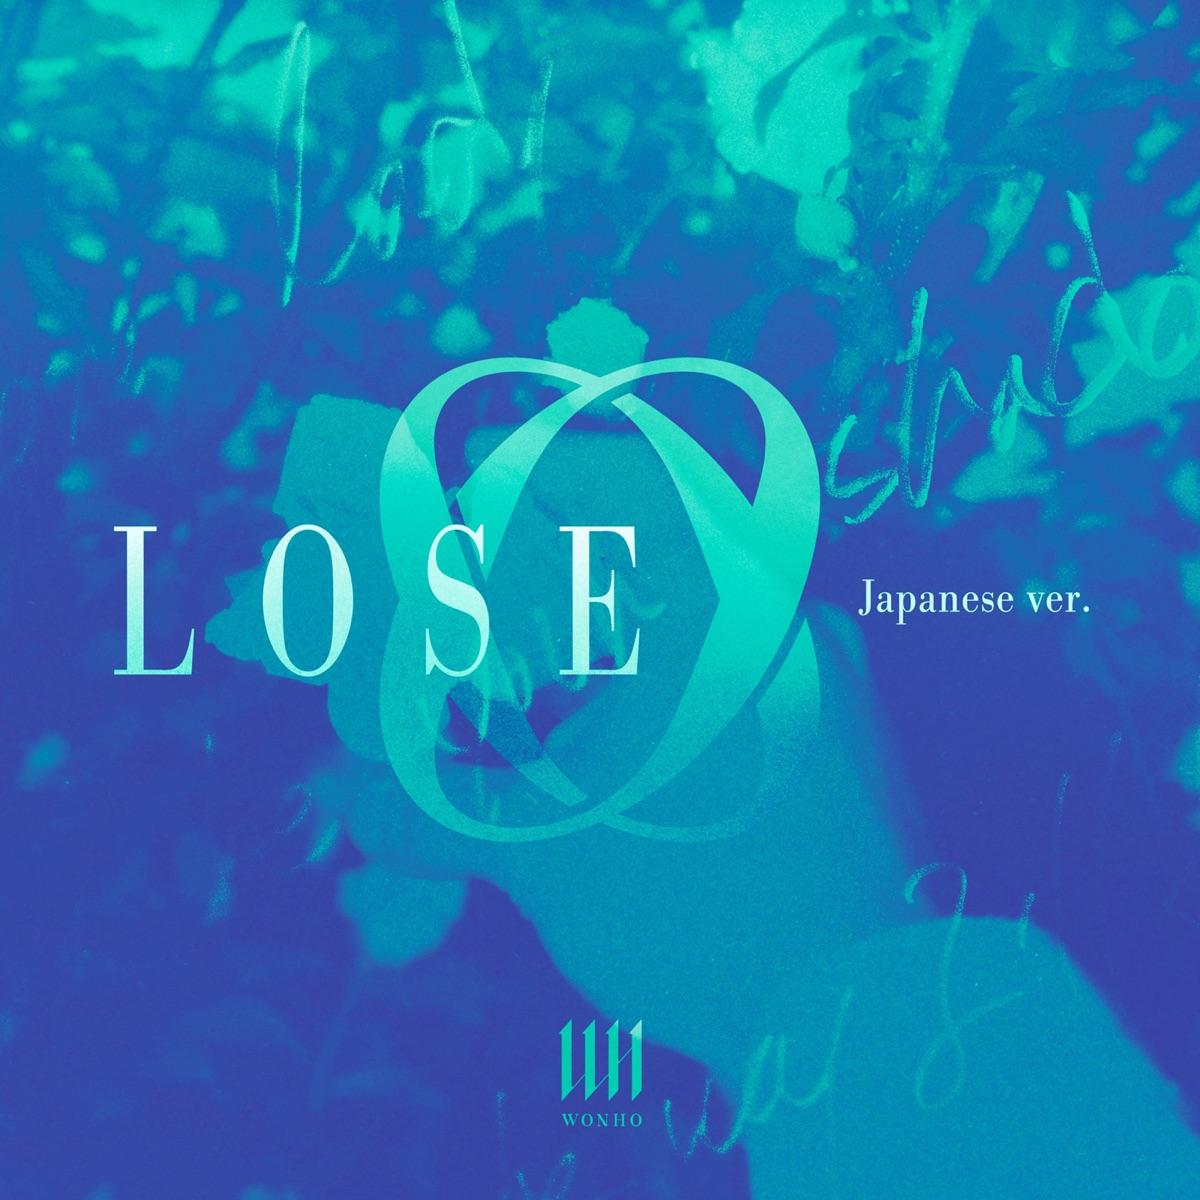 『WONHO - LOSE (Japanese Ver.)』収録の『LOSE (Japanese Ver.)』ジャケット